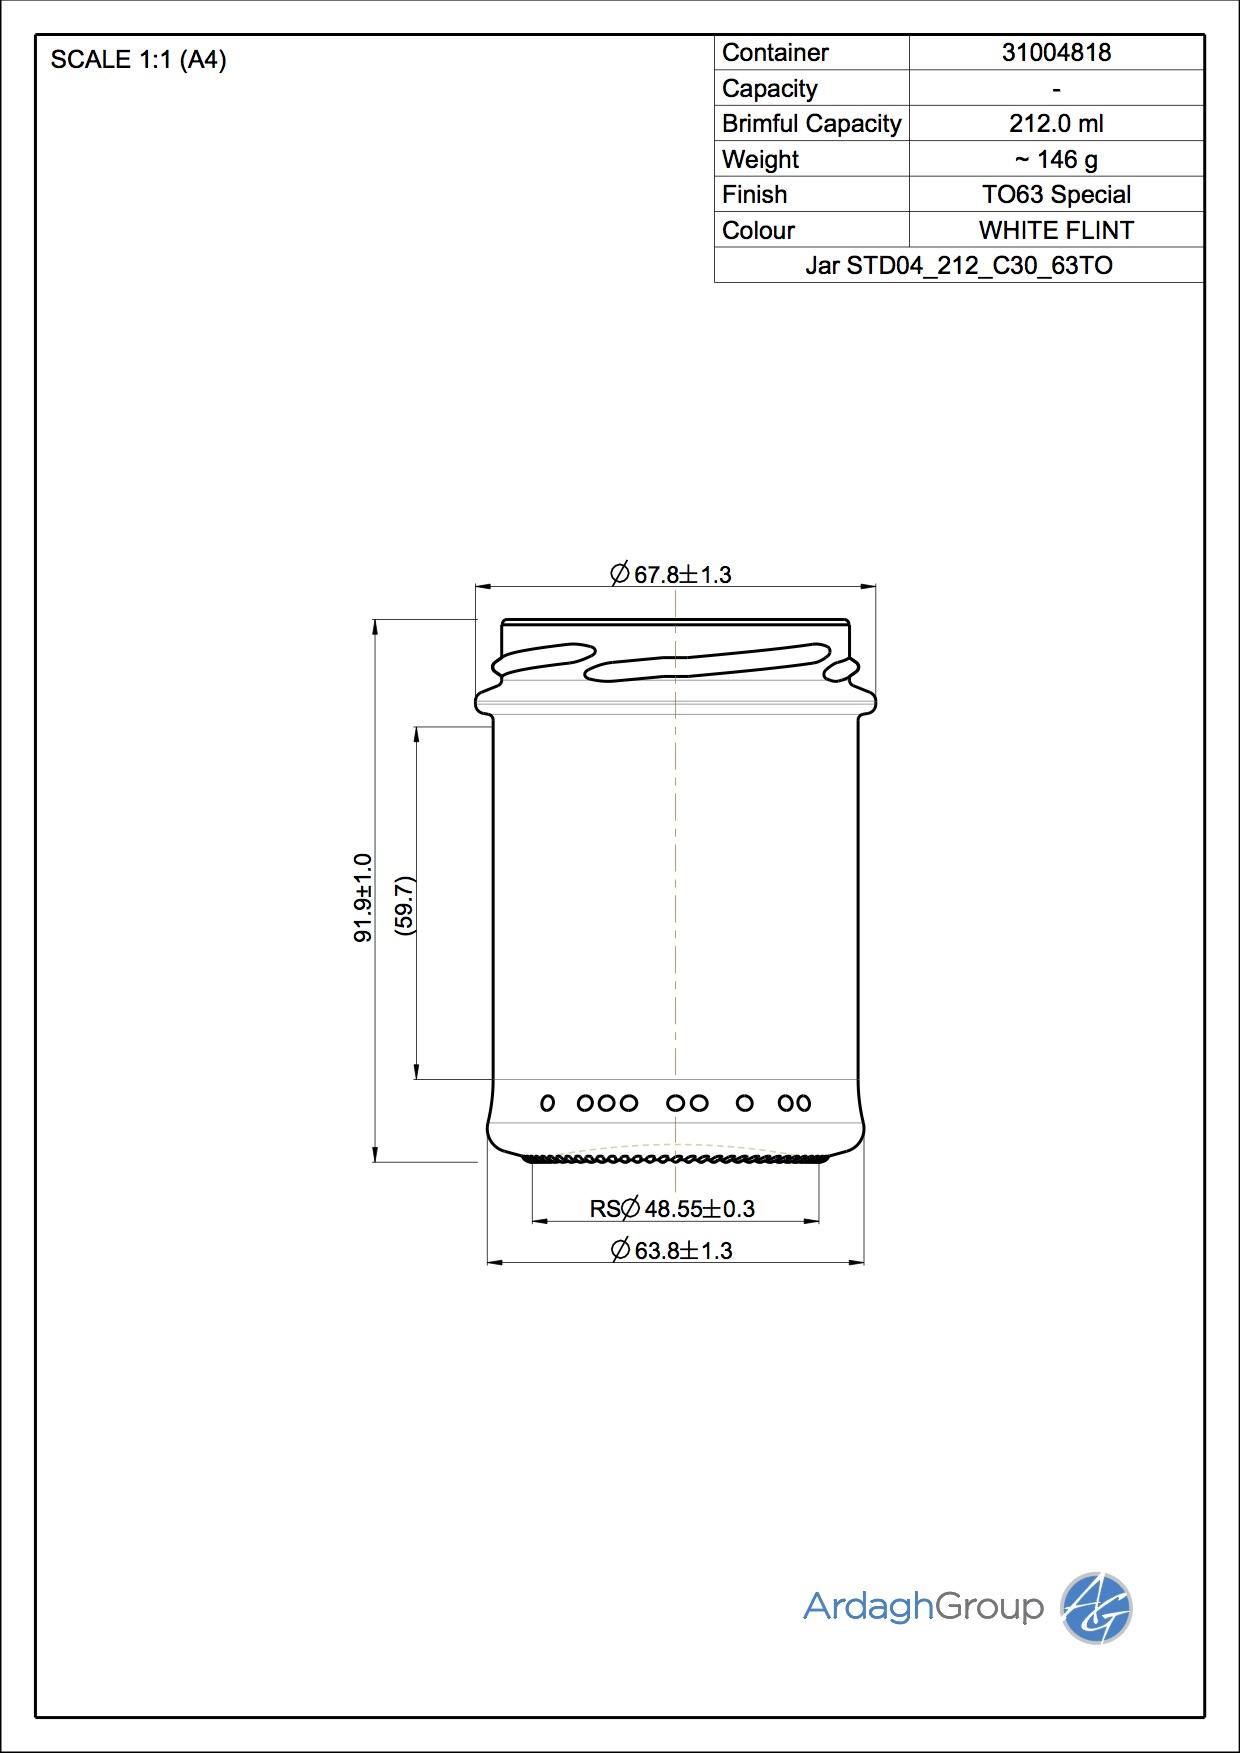 Jar STD04 212 C30 63TO